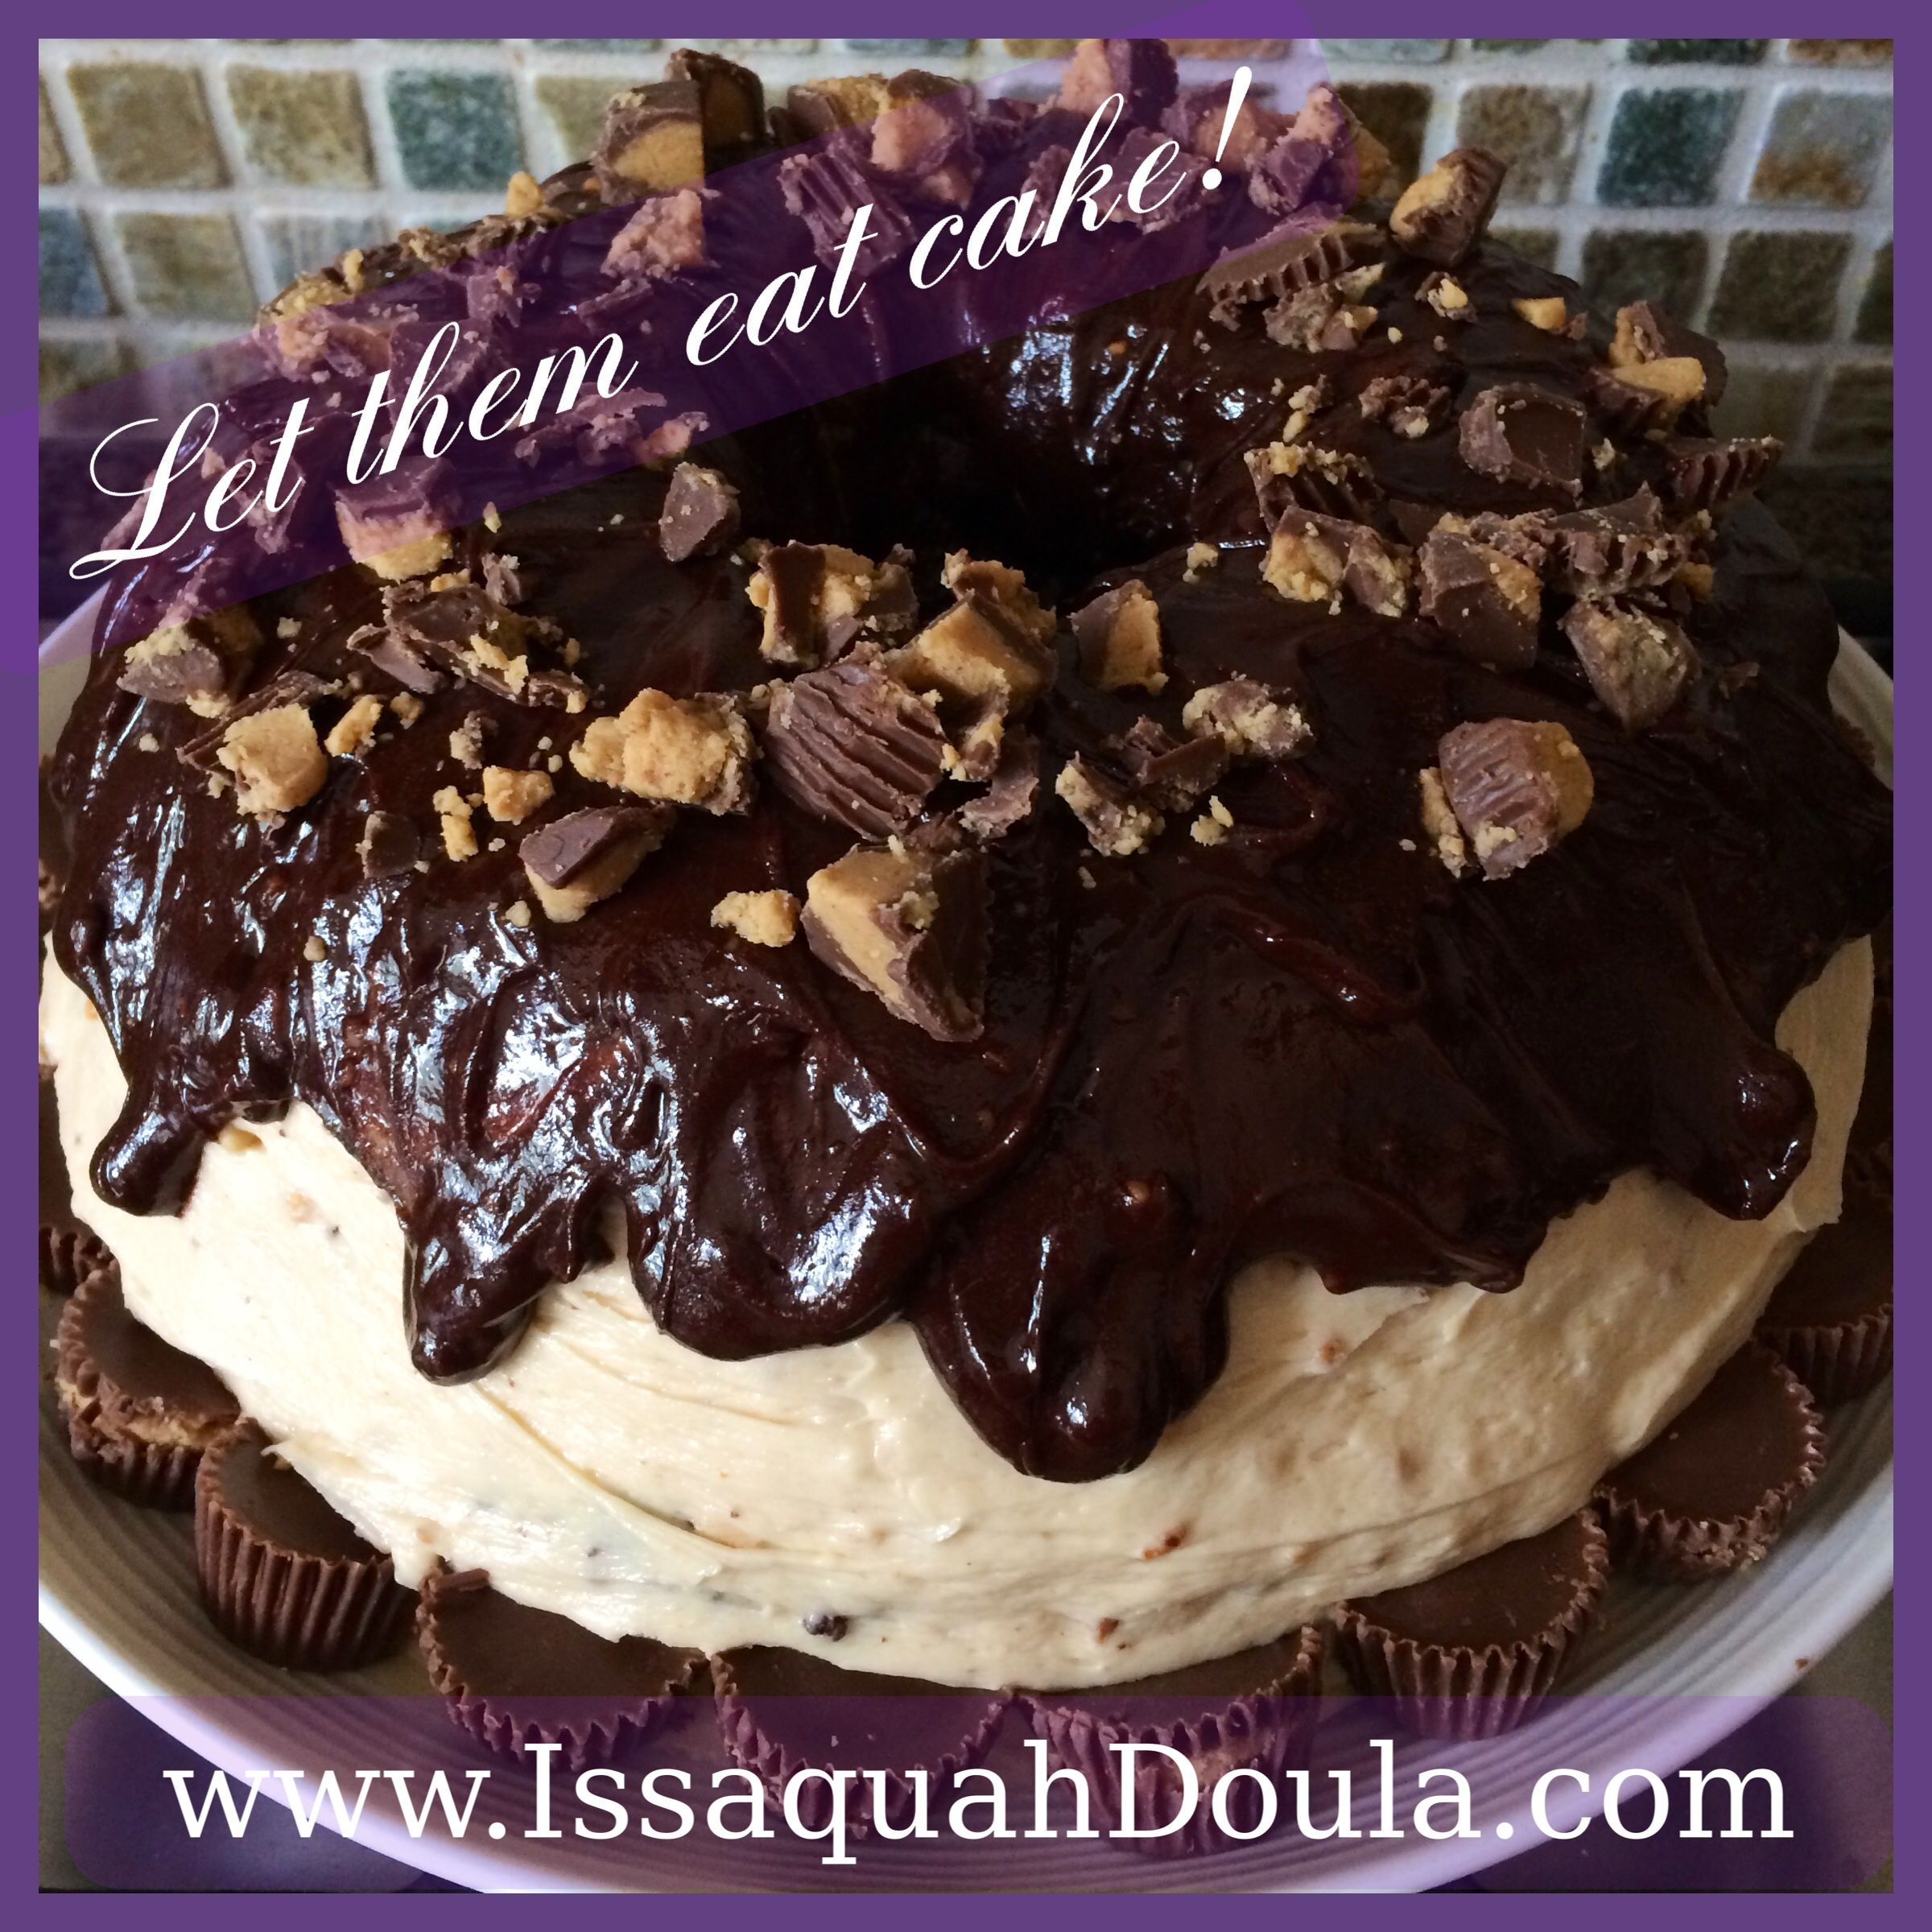 Issaquah Doula's PB & Chocolate Cake